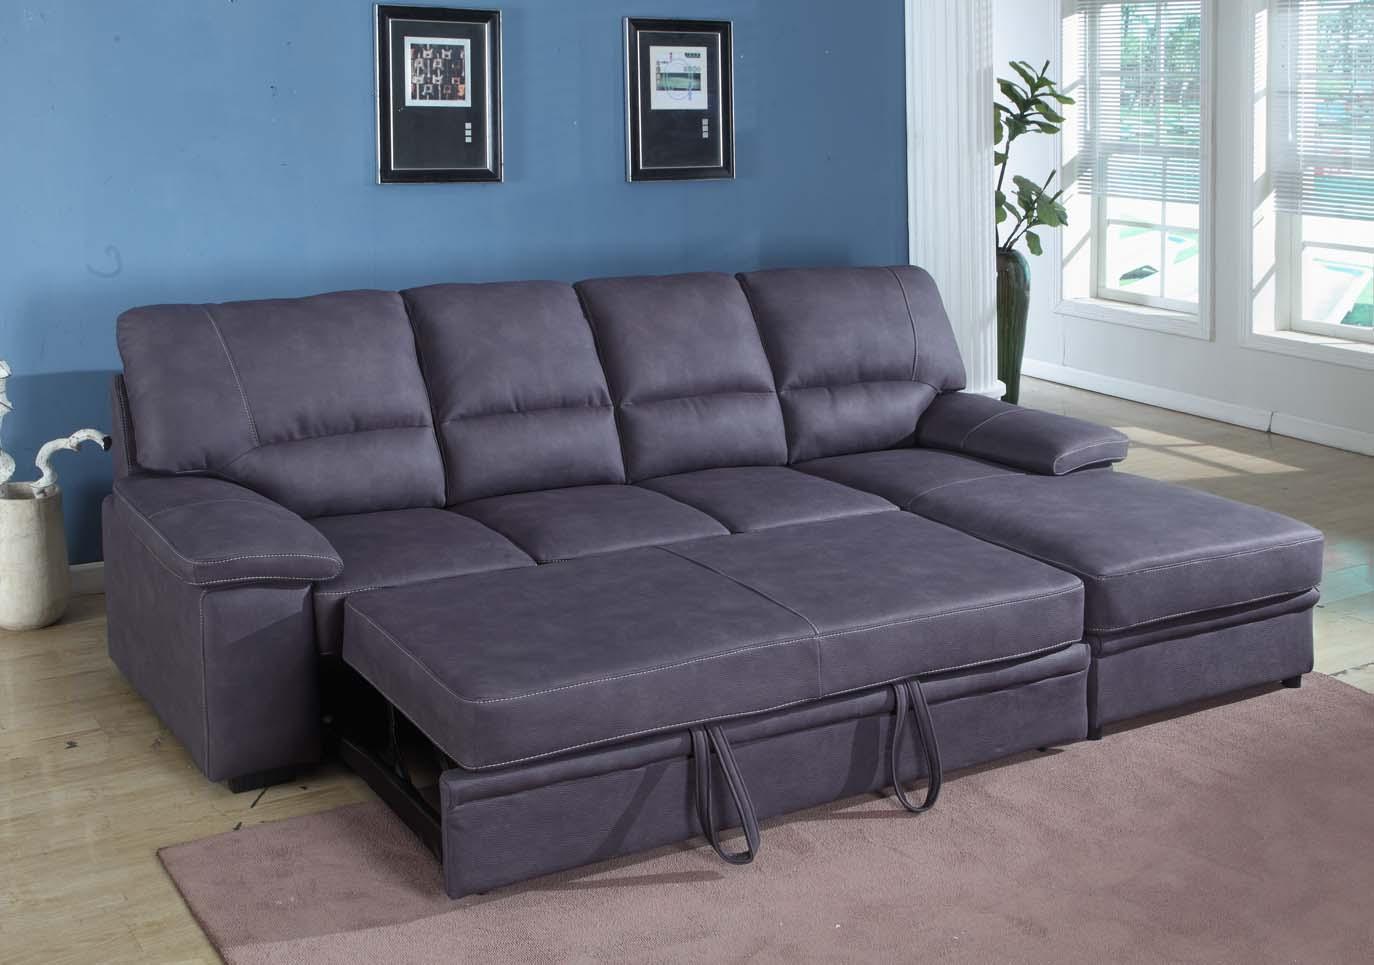 sectional sofa sleeper grey sleeper sectional sofa IAEBHUE